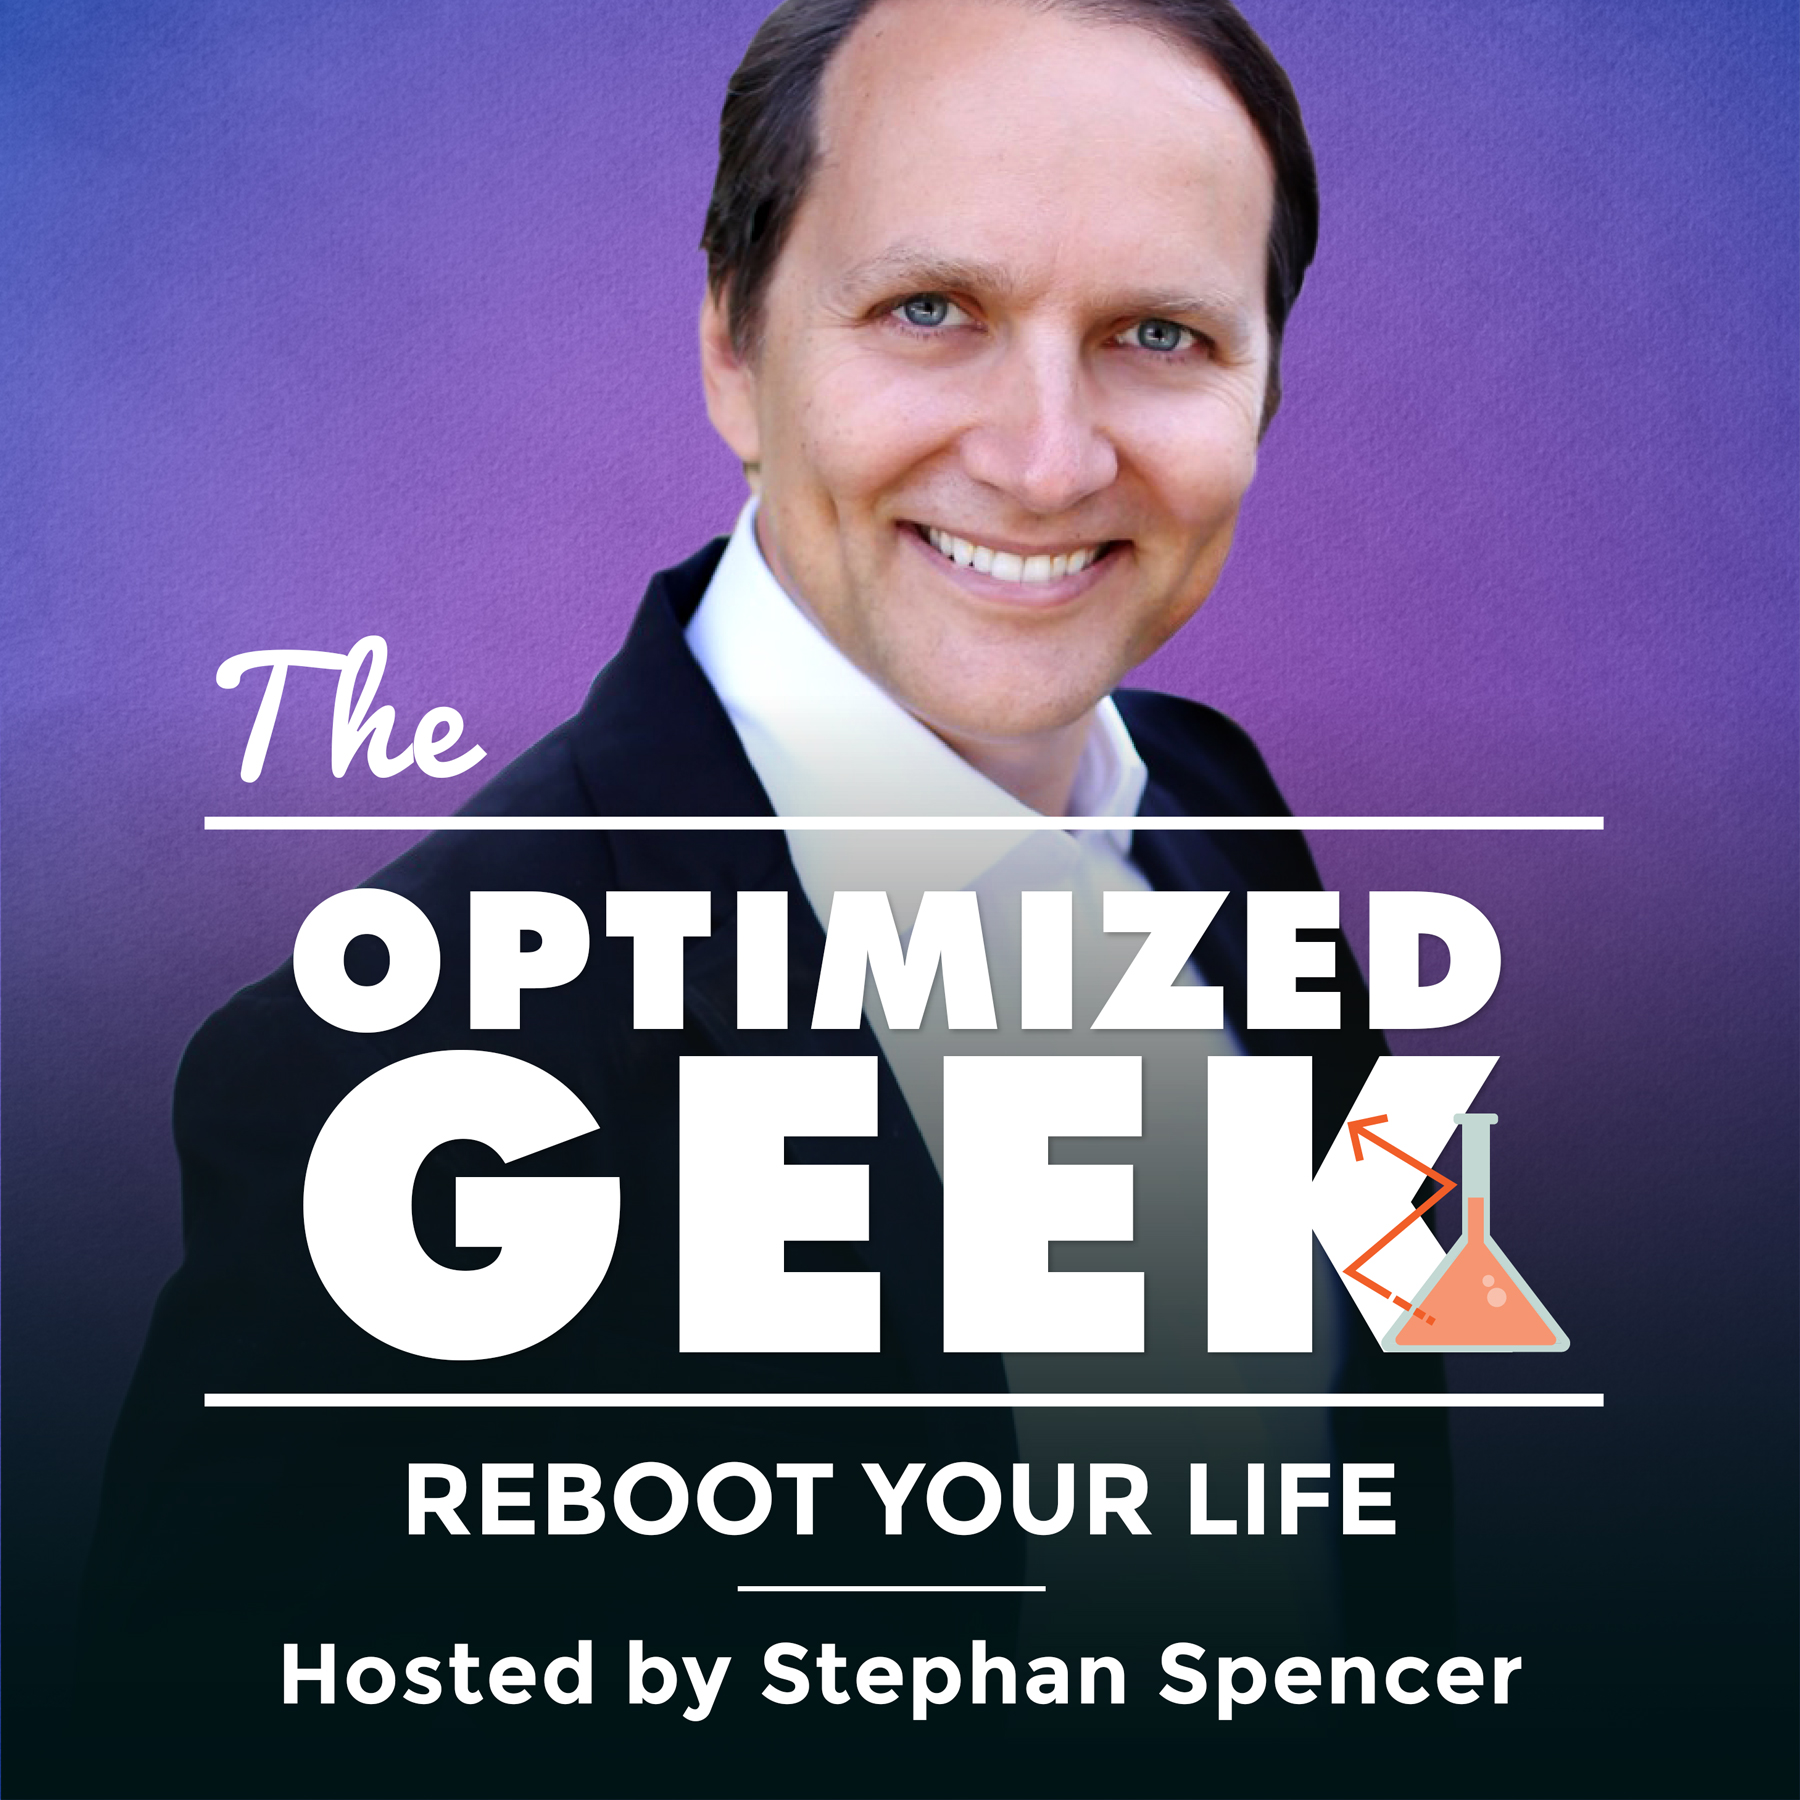 Optimized Geek | Reboot Your Life